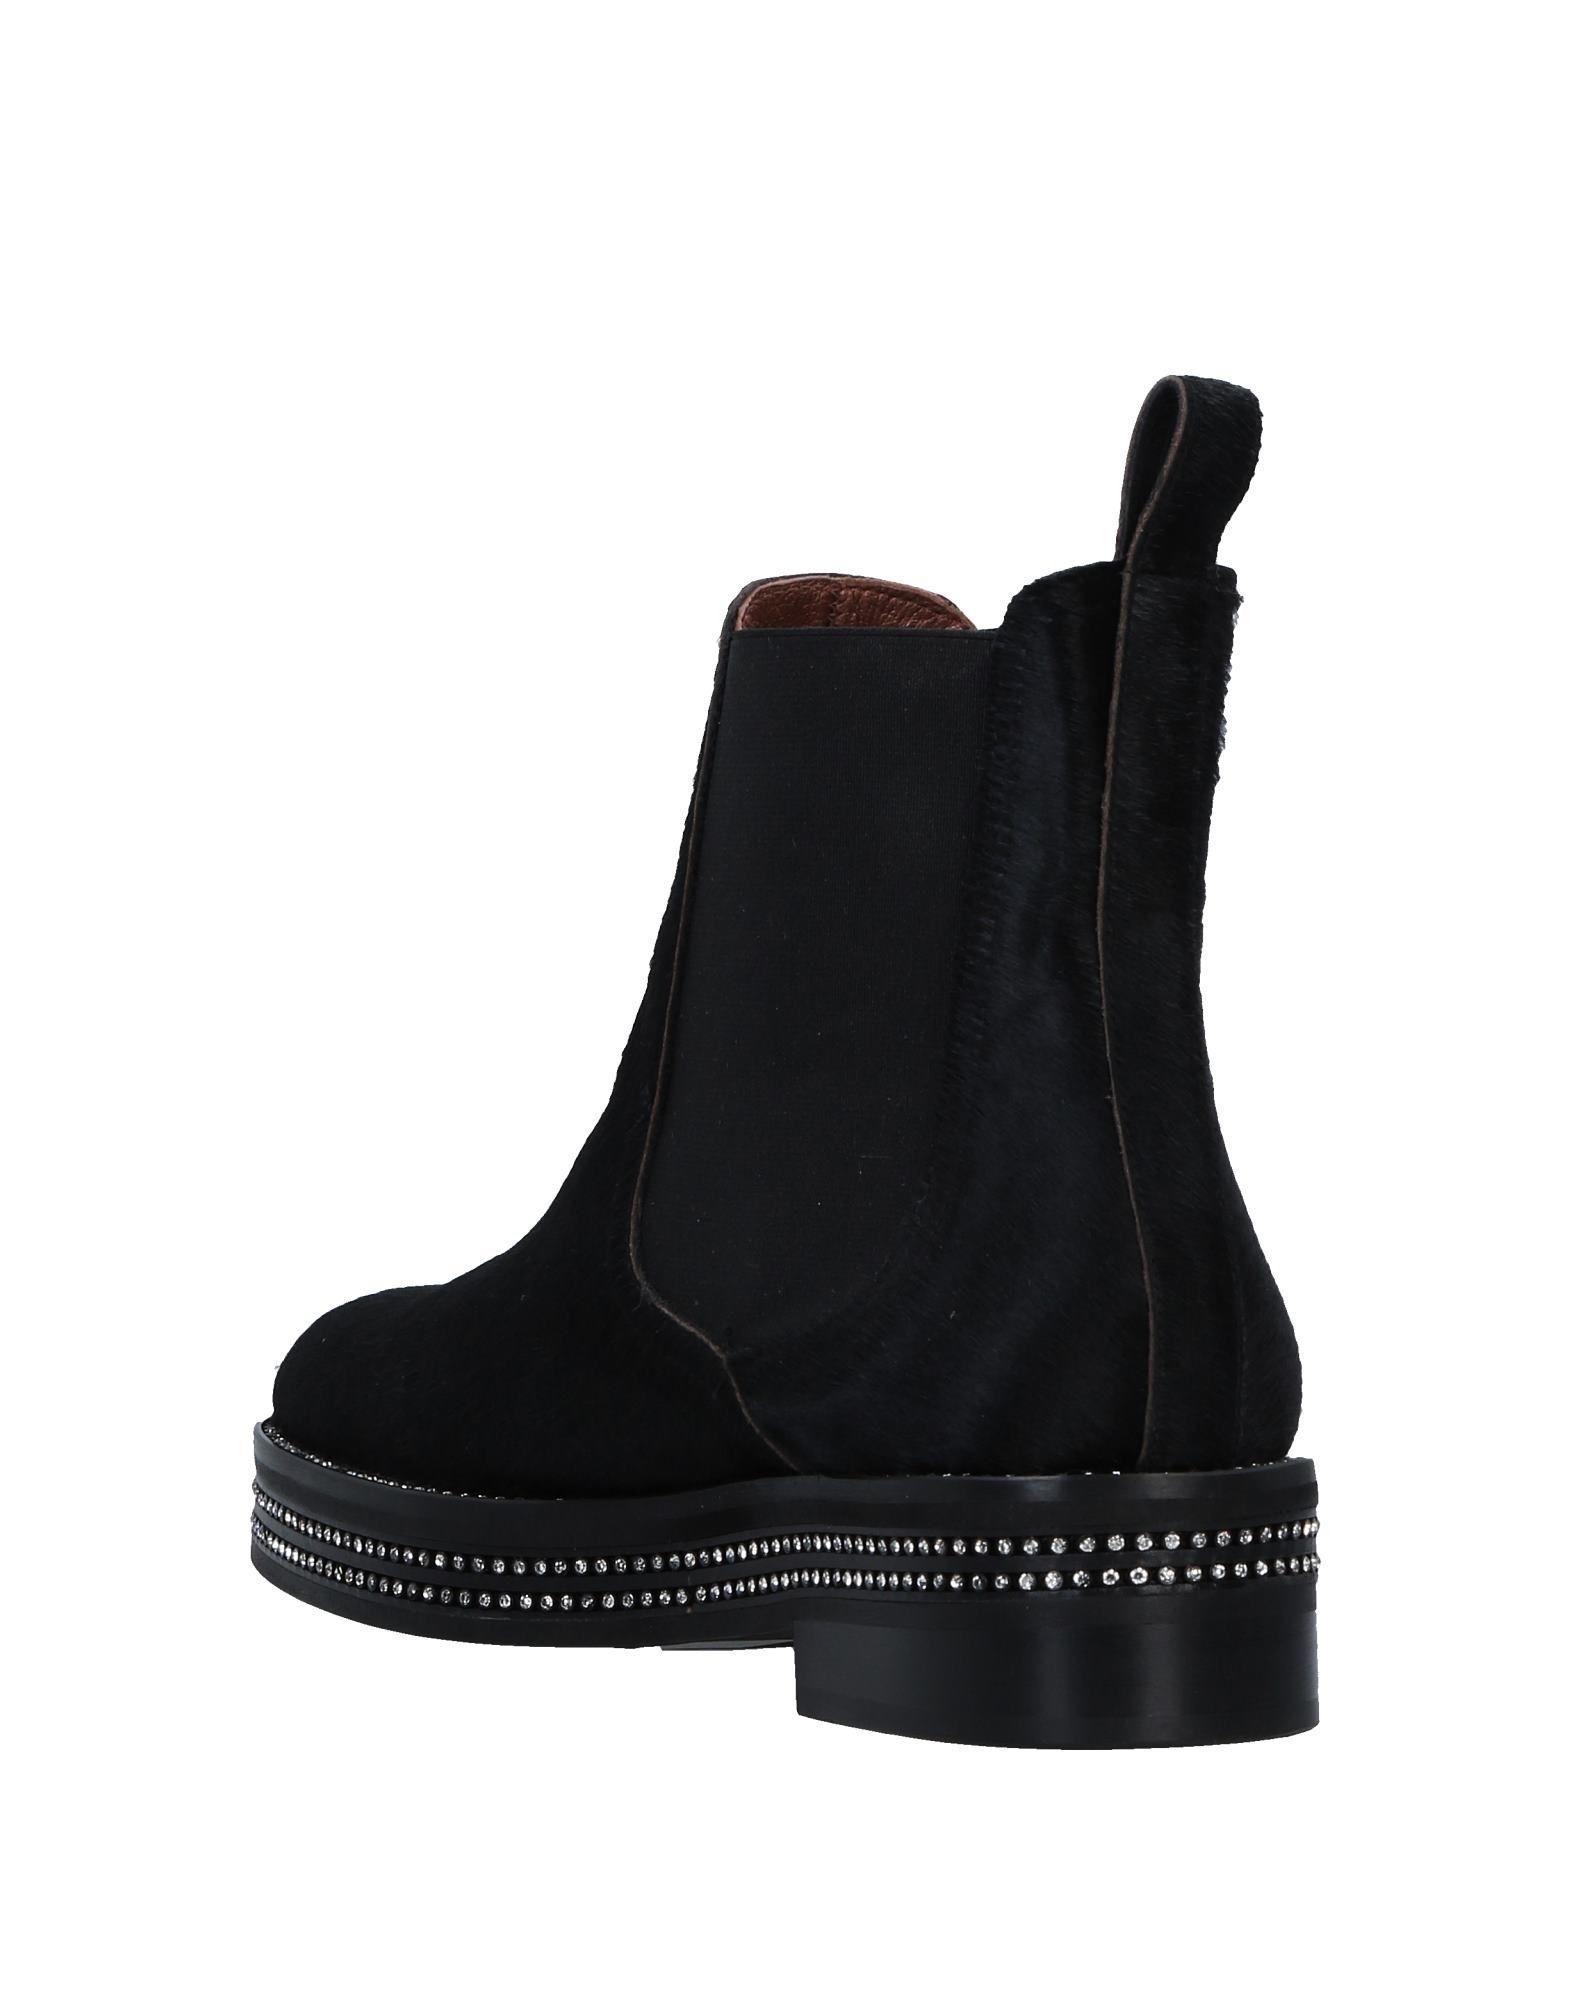 Ras Chelsea Boots strapazierfähige Damen  11527885QHGut aussehende strapazierfähige Boots Schuhe 999bd4